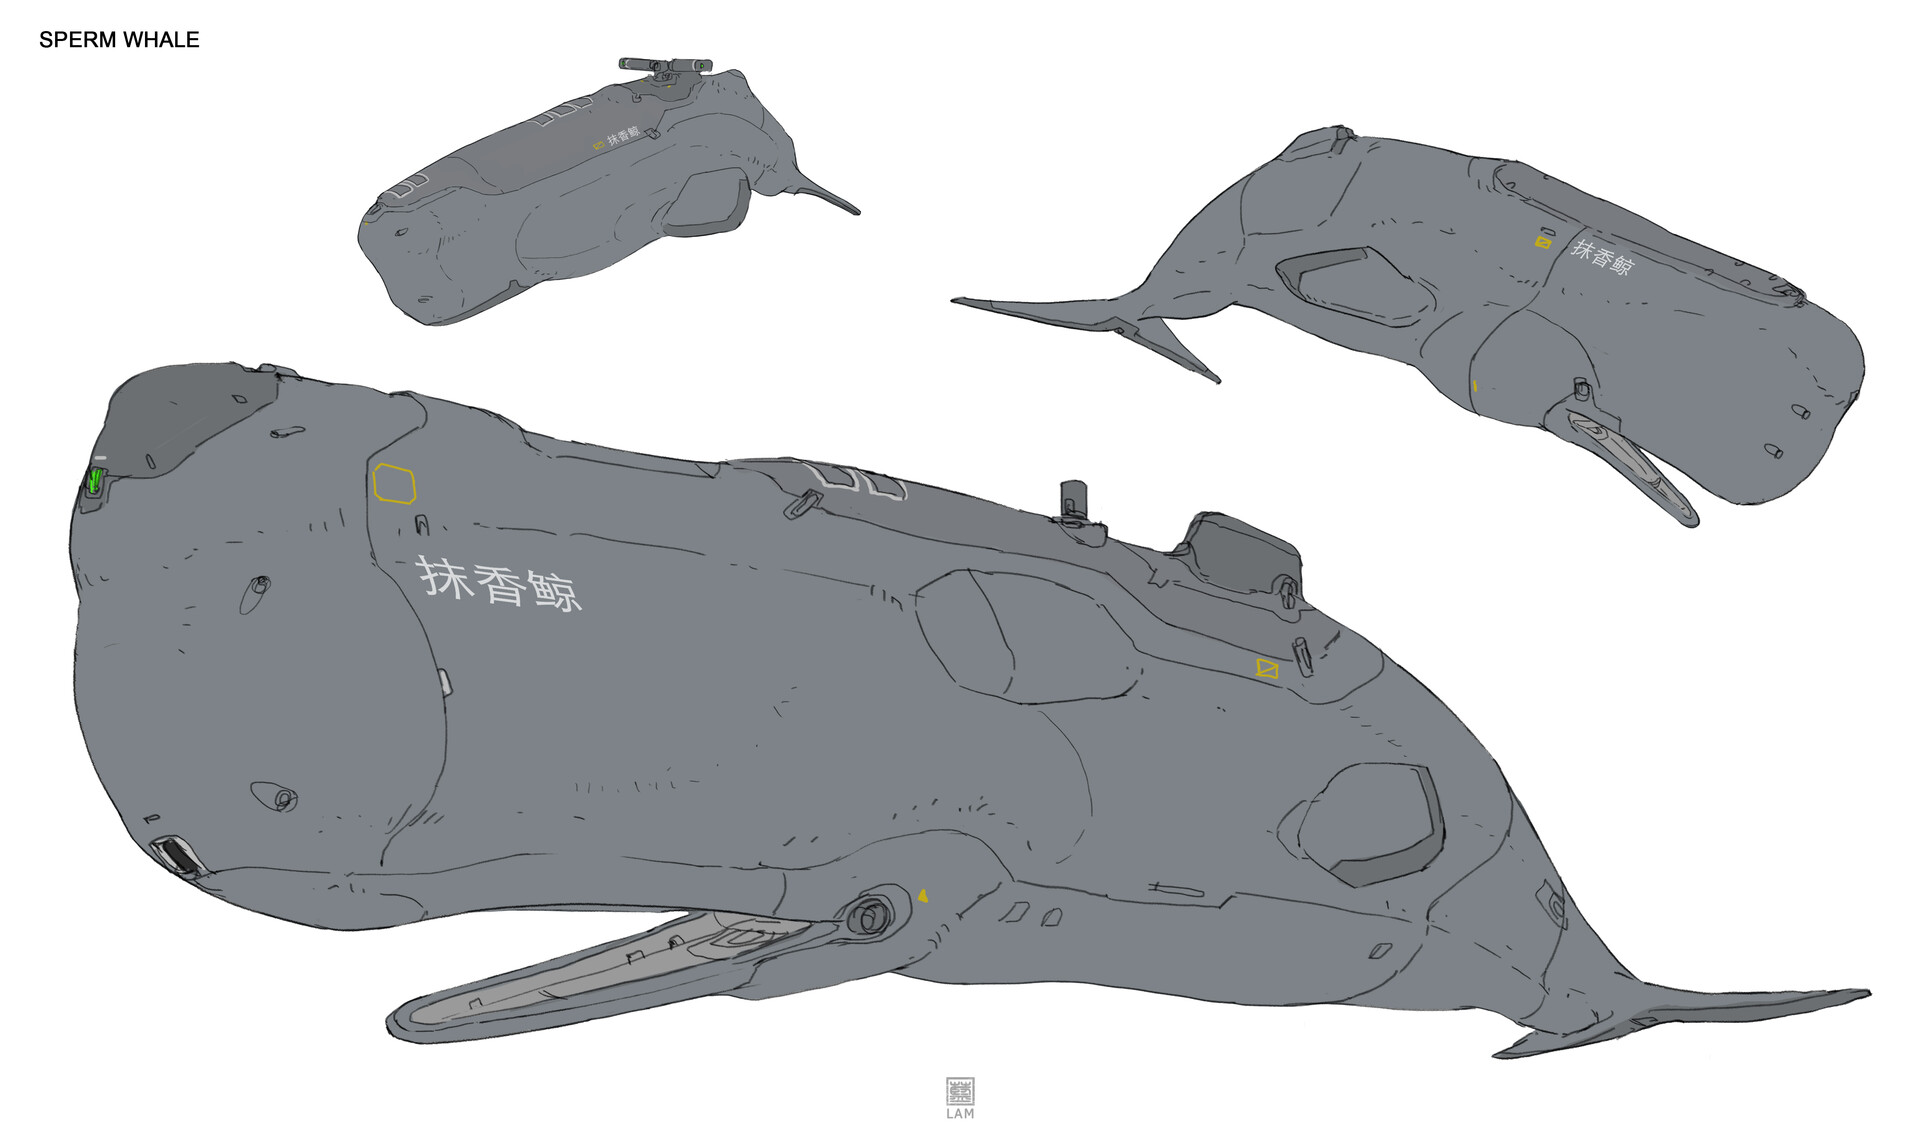 Sheng lam 8 sperm whale